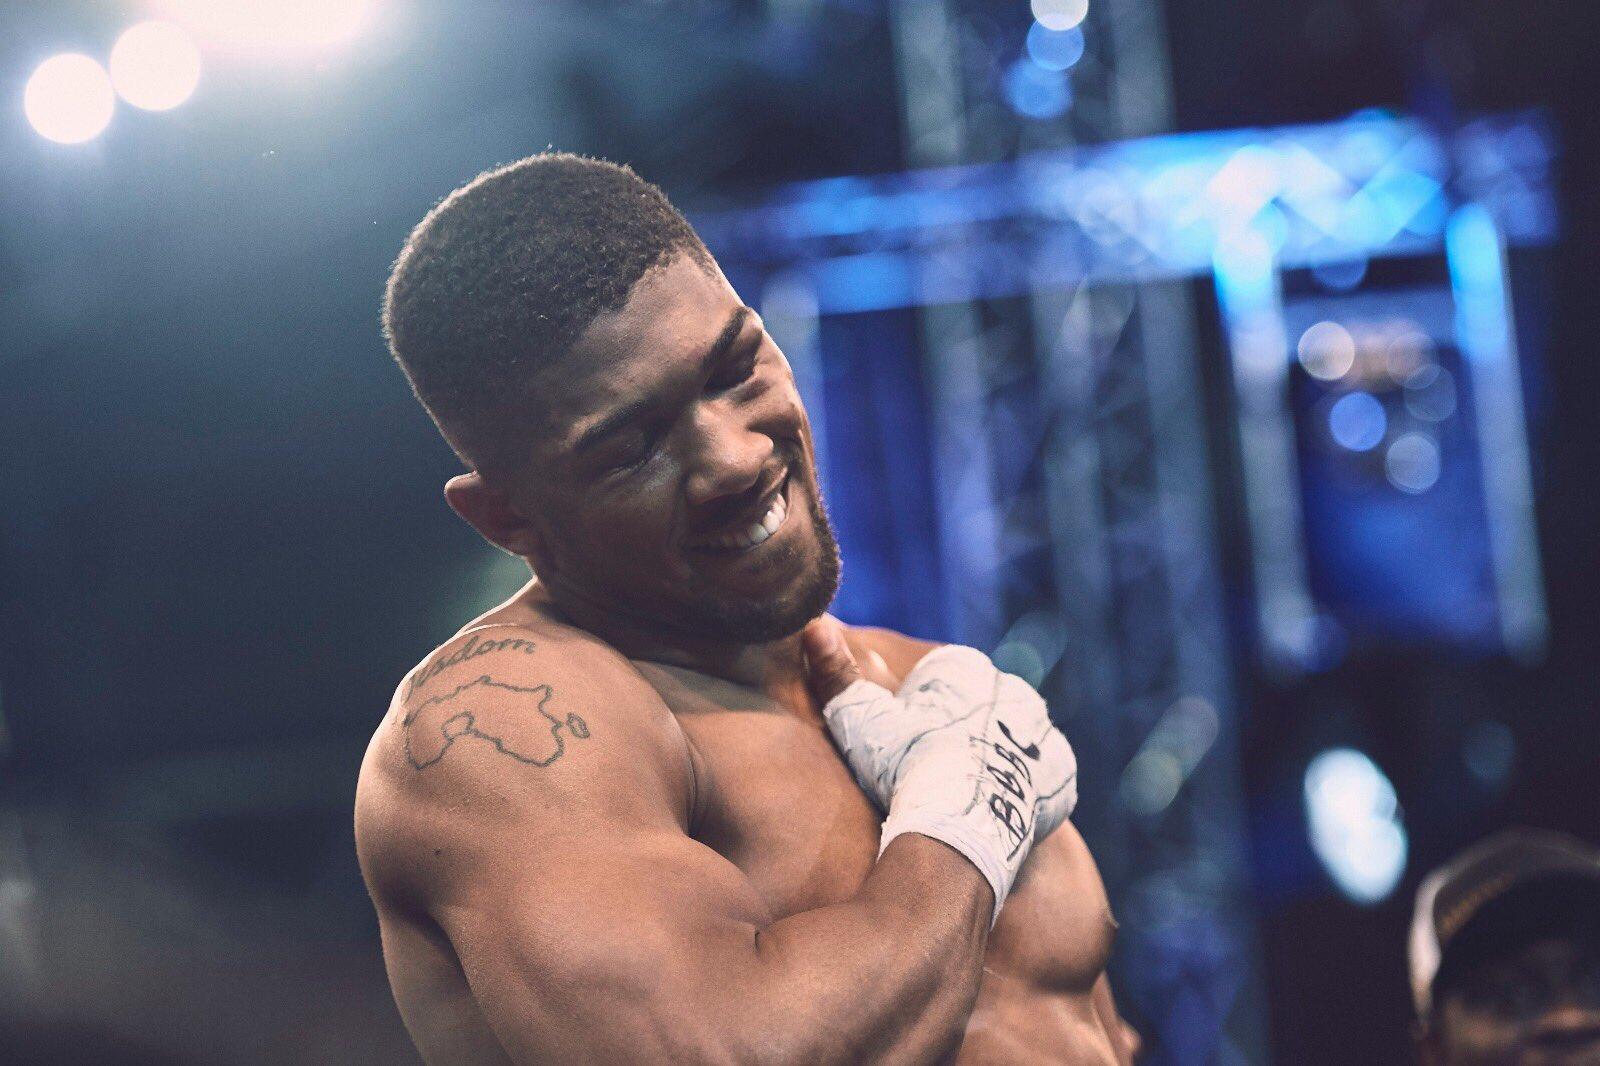 IT WASN'T ME! Joshua Denies Affair With Fellow Boxer's Wife